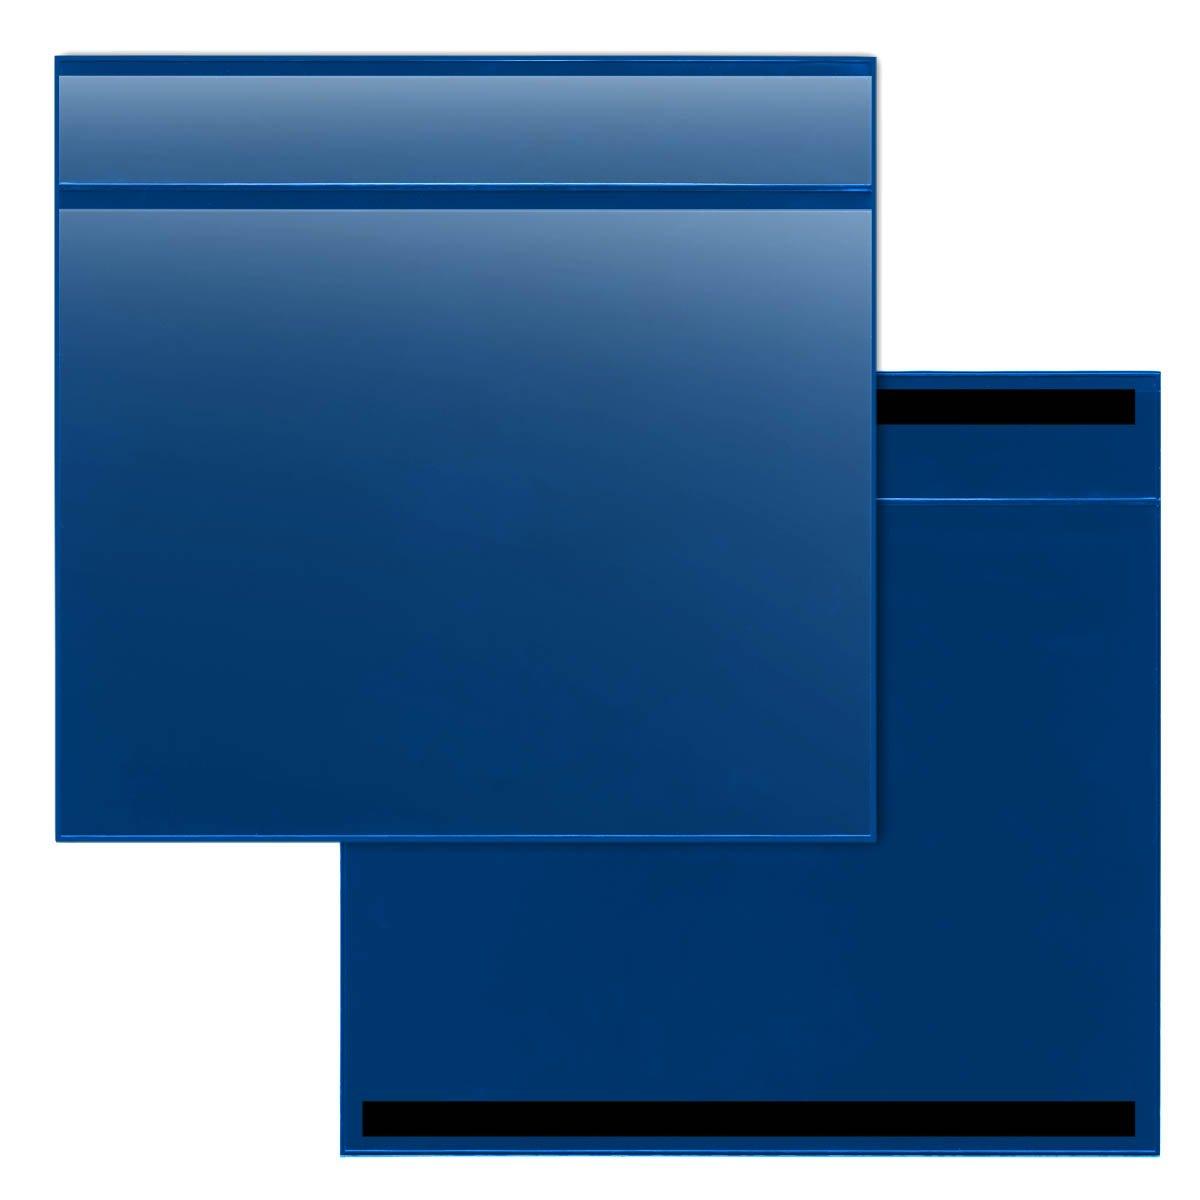 STORE SMART - 100-Pack Blue Document Holder with Title Pocket - Horizontal - R529PQBM-100